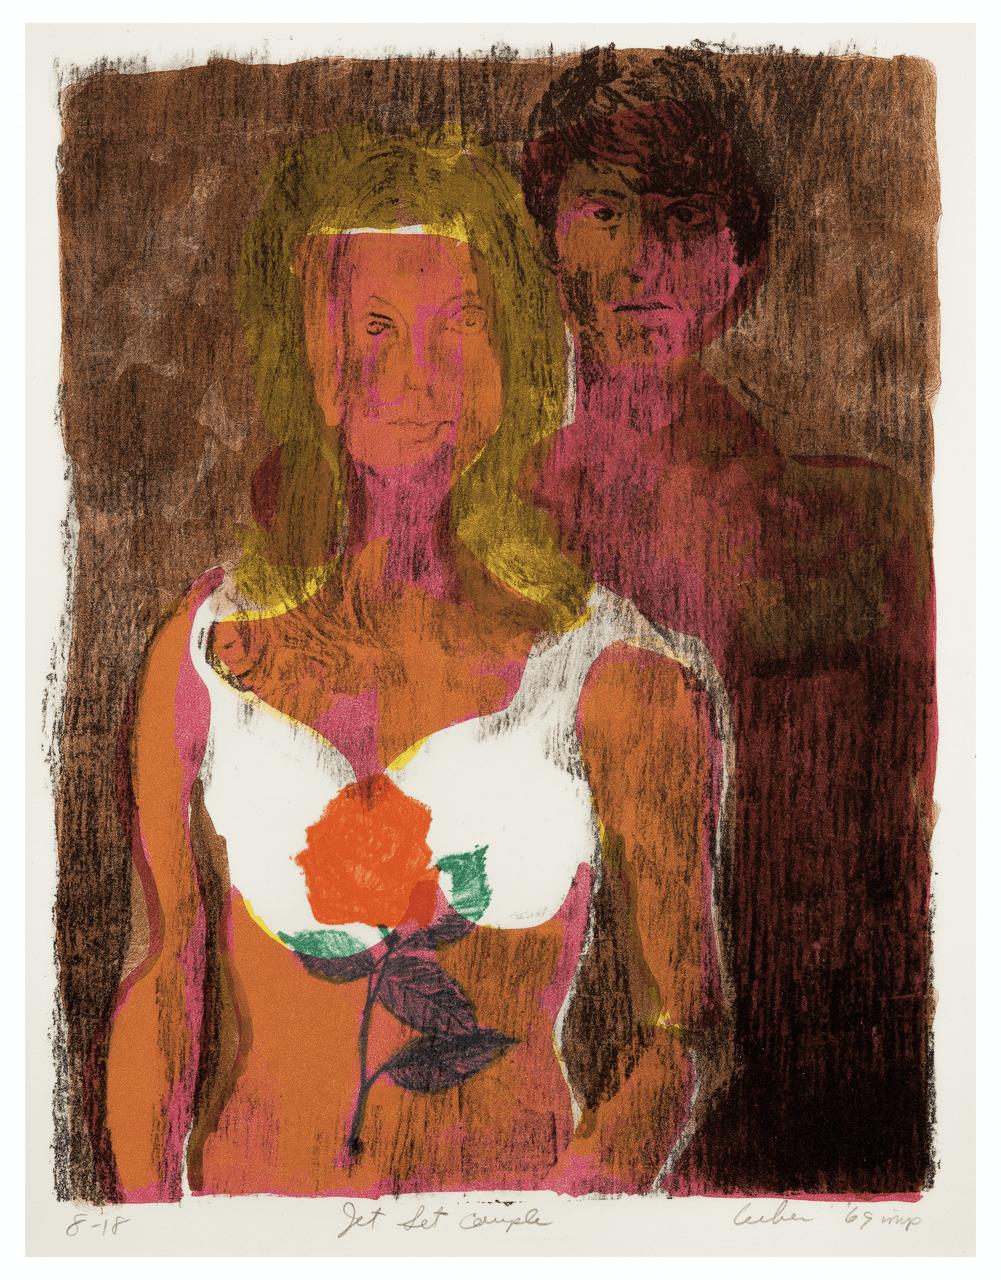 "A Vintage Intaglio Etching Print ""Jet Set Couple"" By Luben Dimanov 1969"